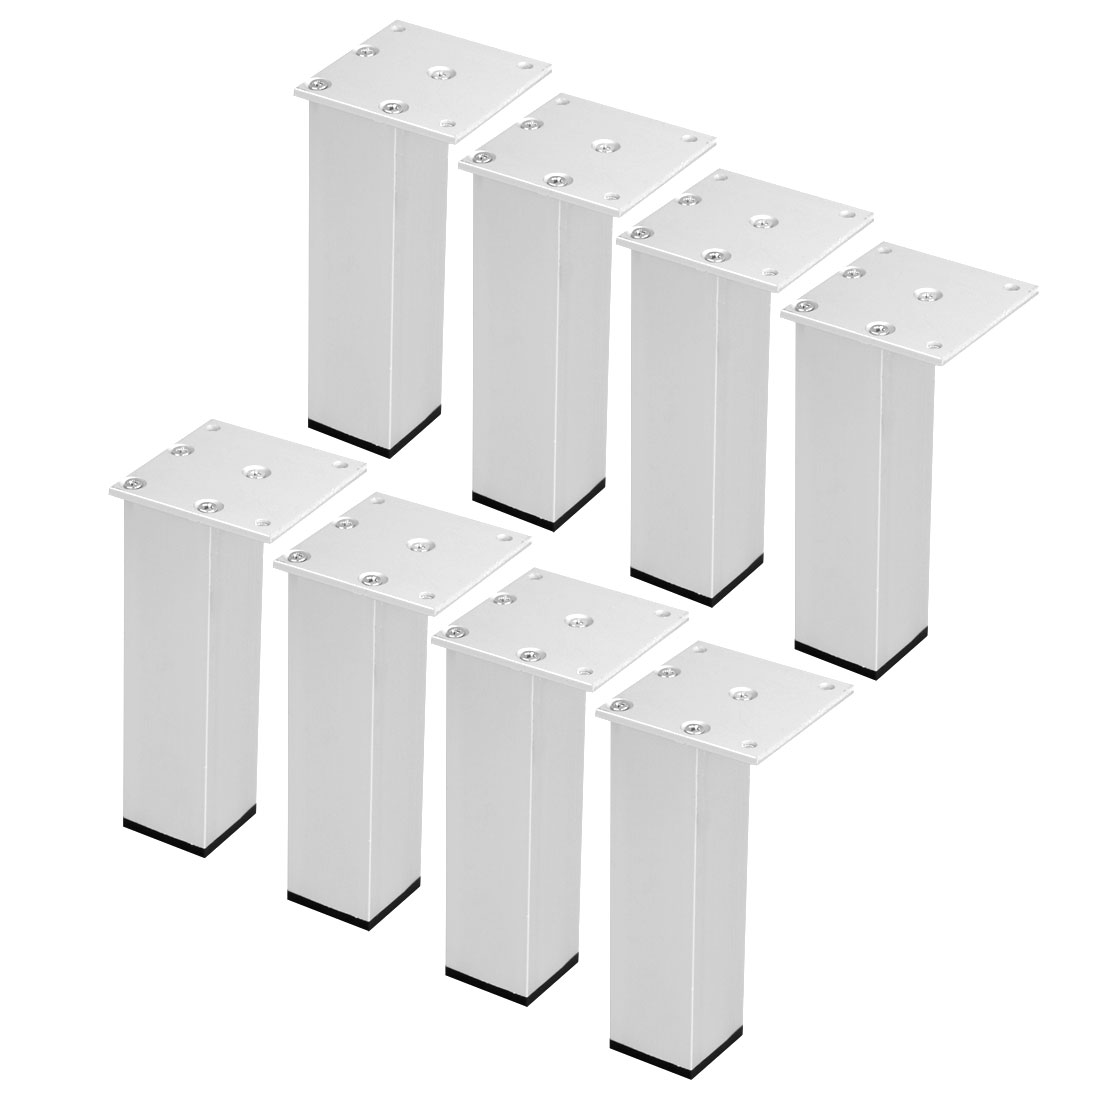 "6"" Furniture Legs Aluminium Alloy Table Feet Replacement Height Adjuster 8pcs"